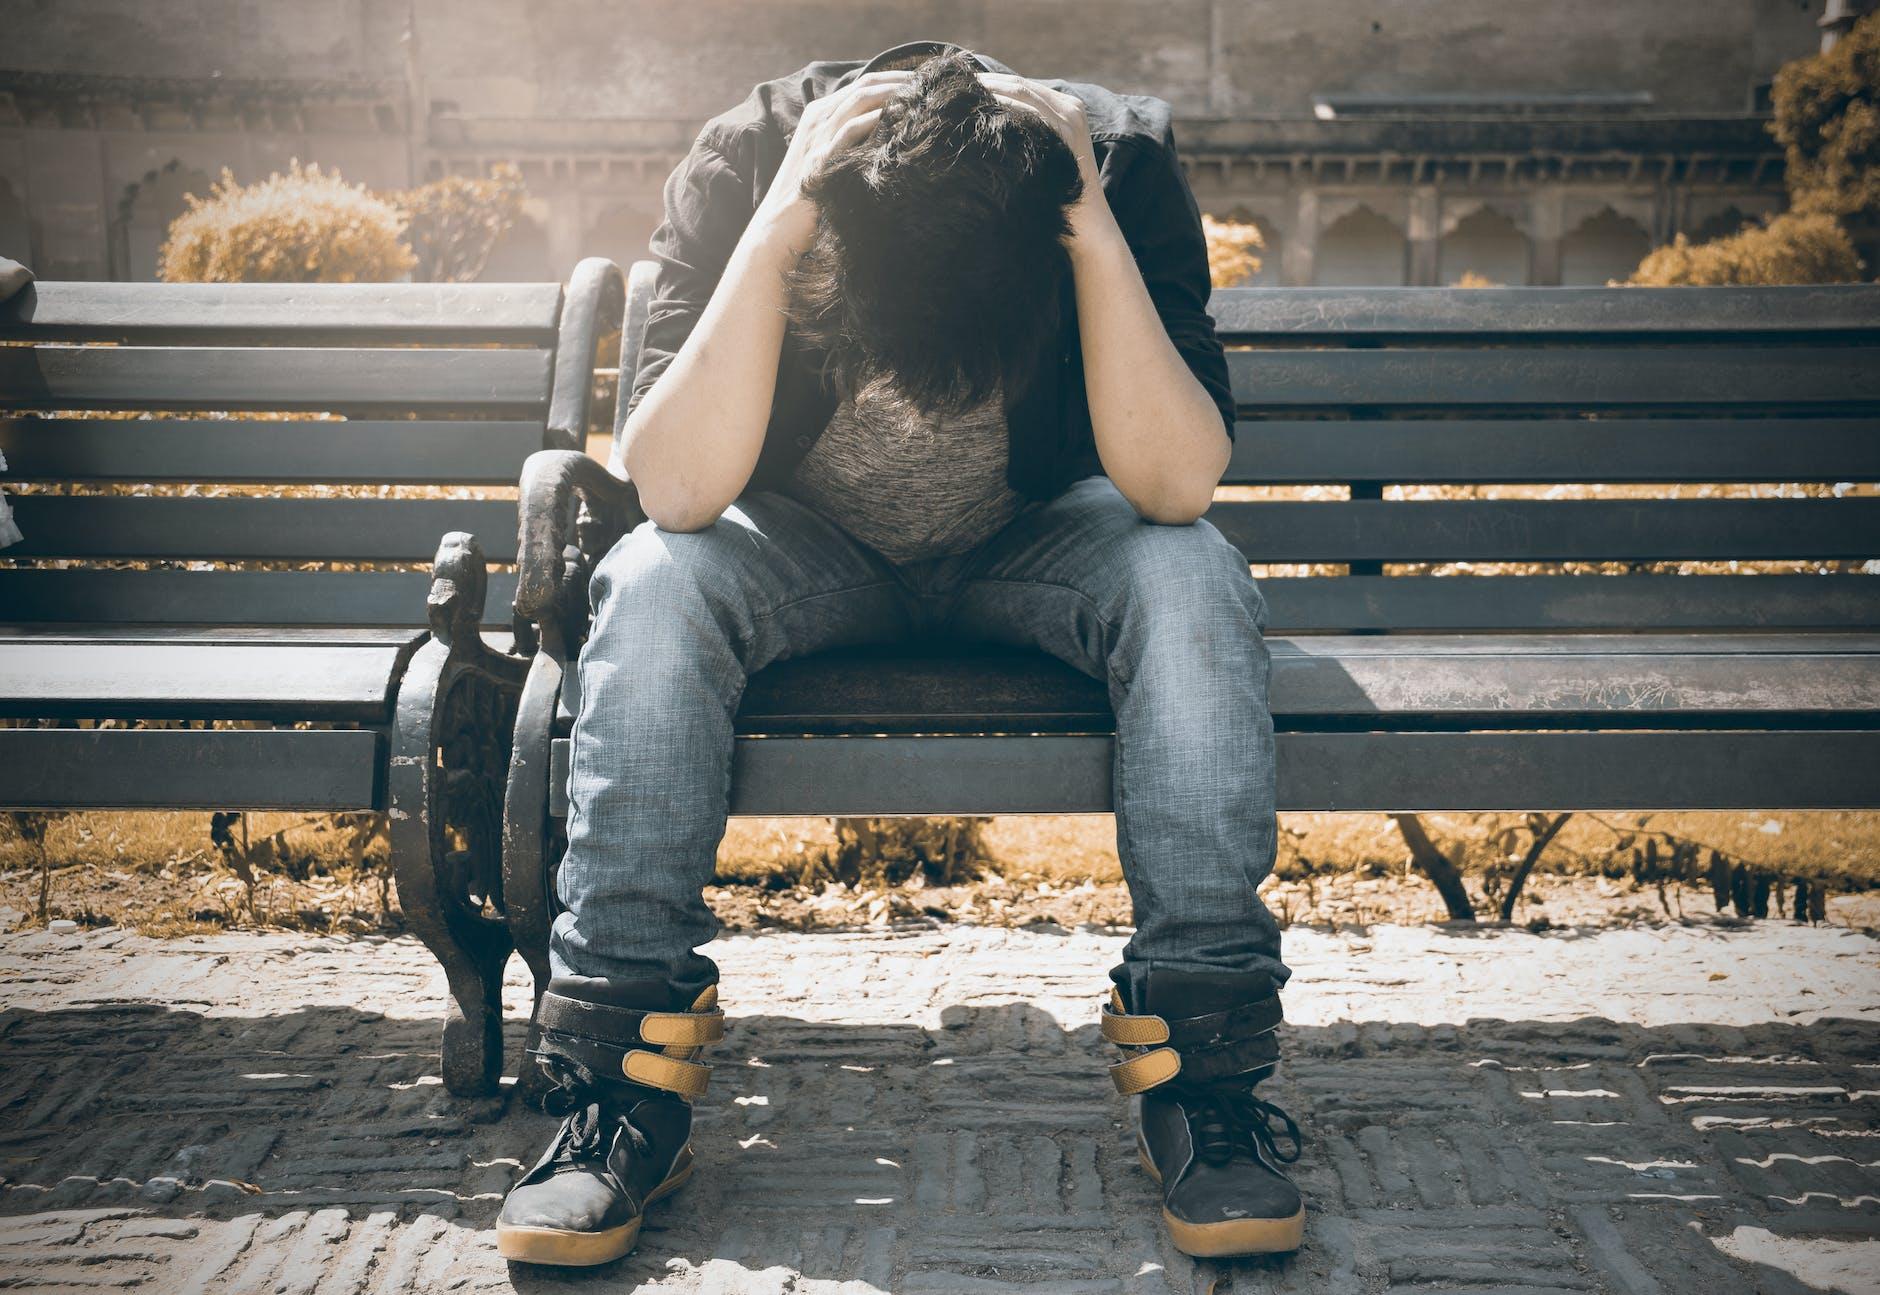 Man sitting on bench | Photo: Pexels